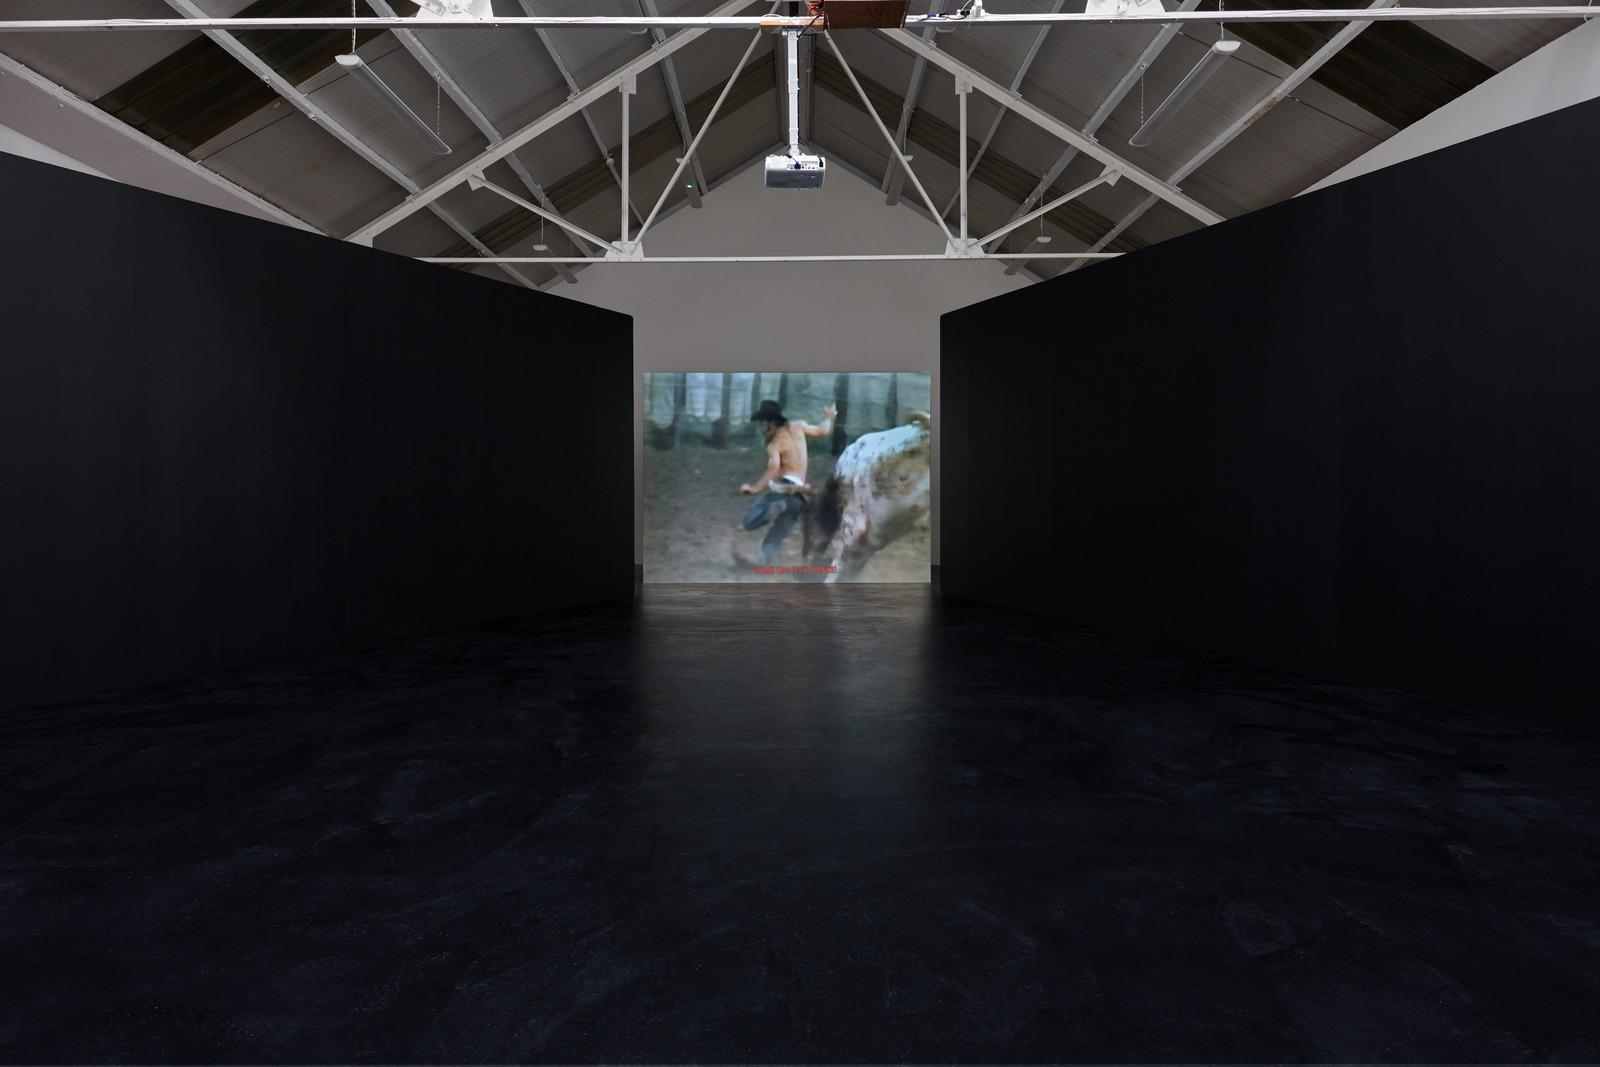 Ryan Estep - 5 - Installation View I